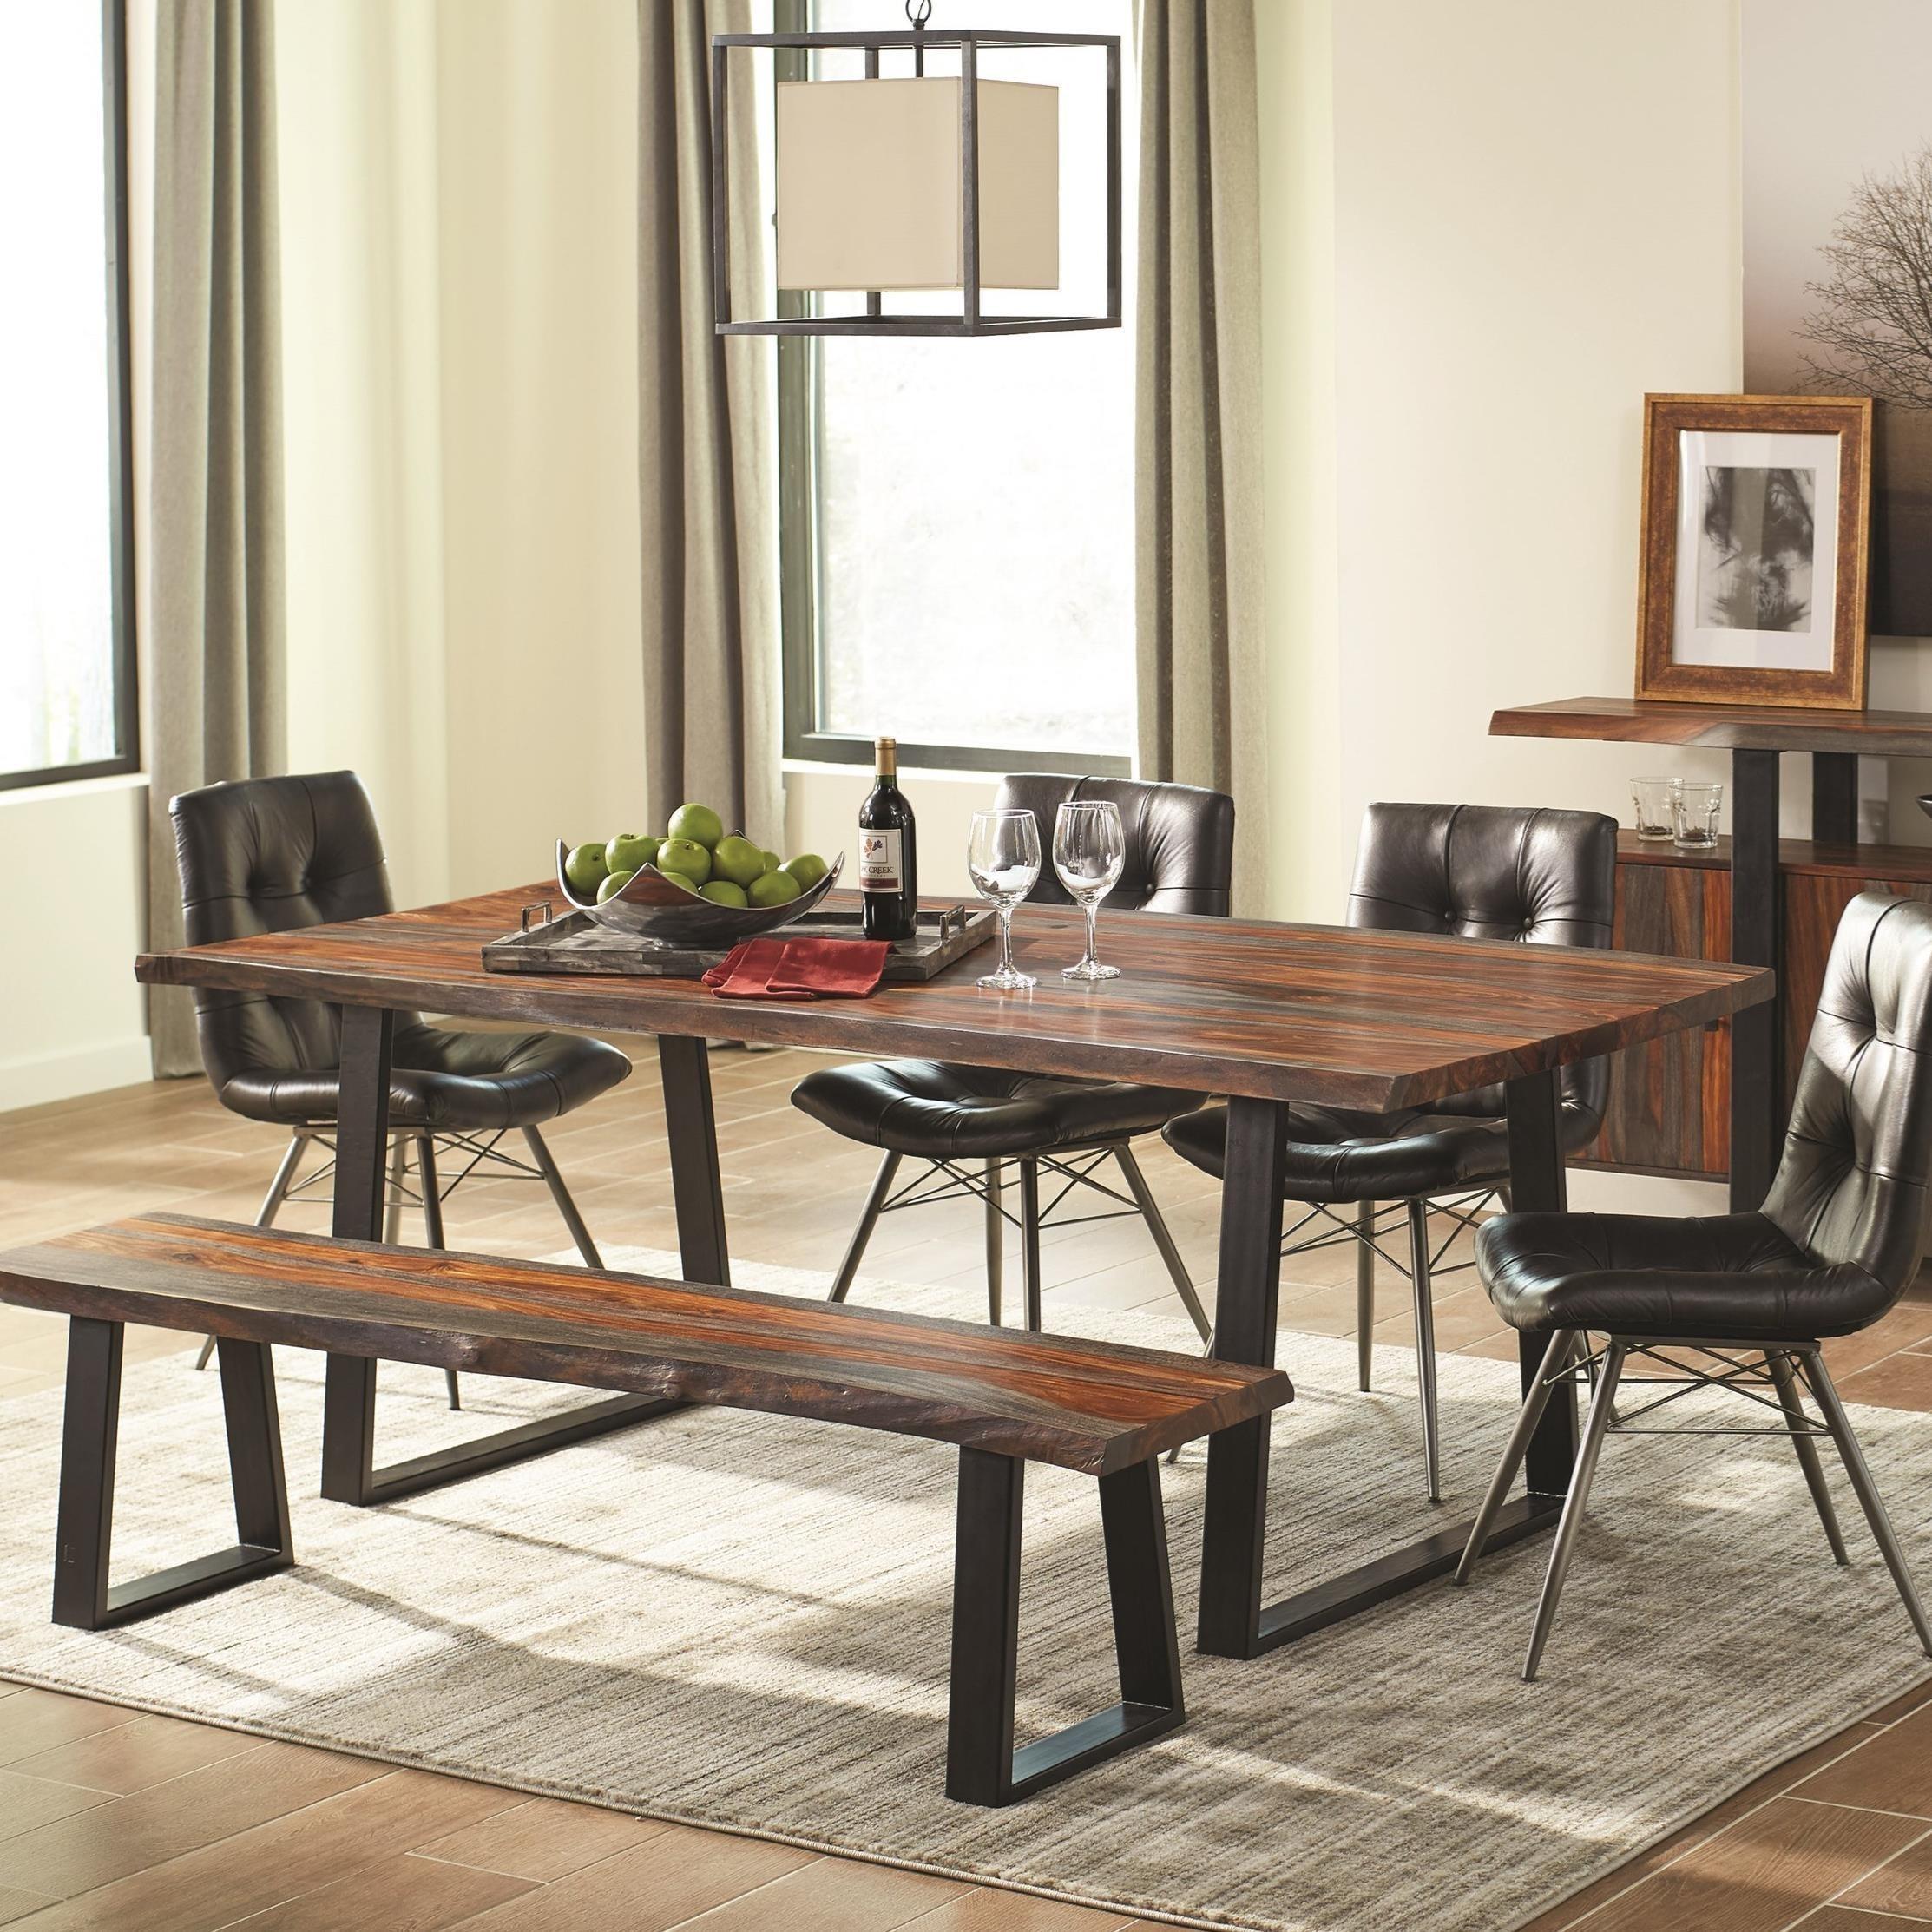 scott living jamestown rustic live edge dining table belfort furniture dining tables. Black Bedroom Furniture Sets. Home Design Ideas